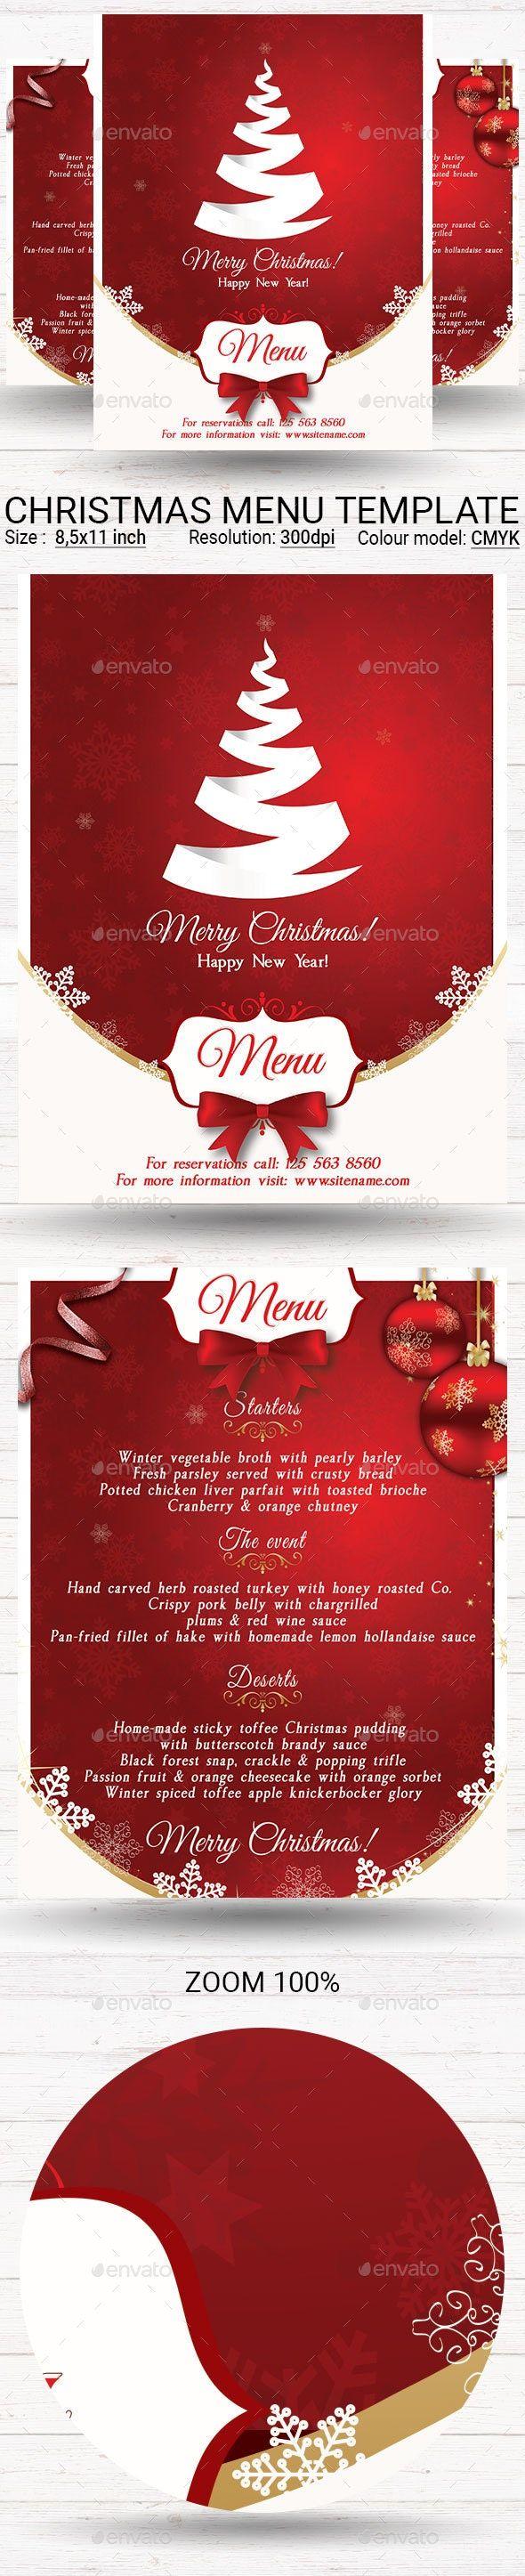 Christmas Menu Christmas Menu Menu Template Restaurant Flyer